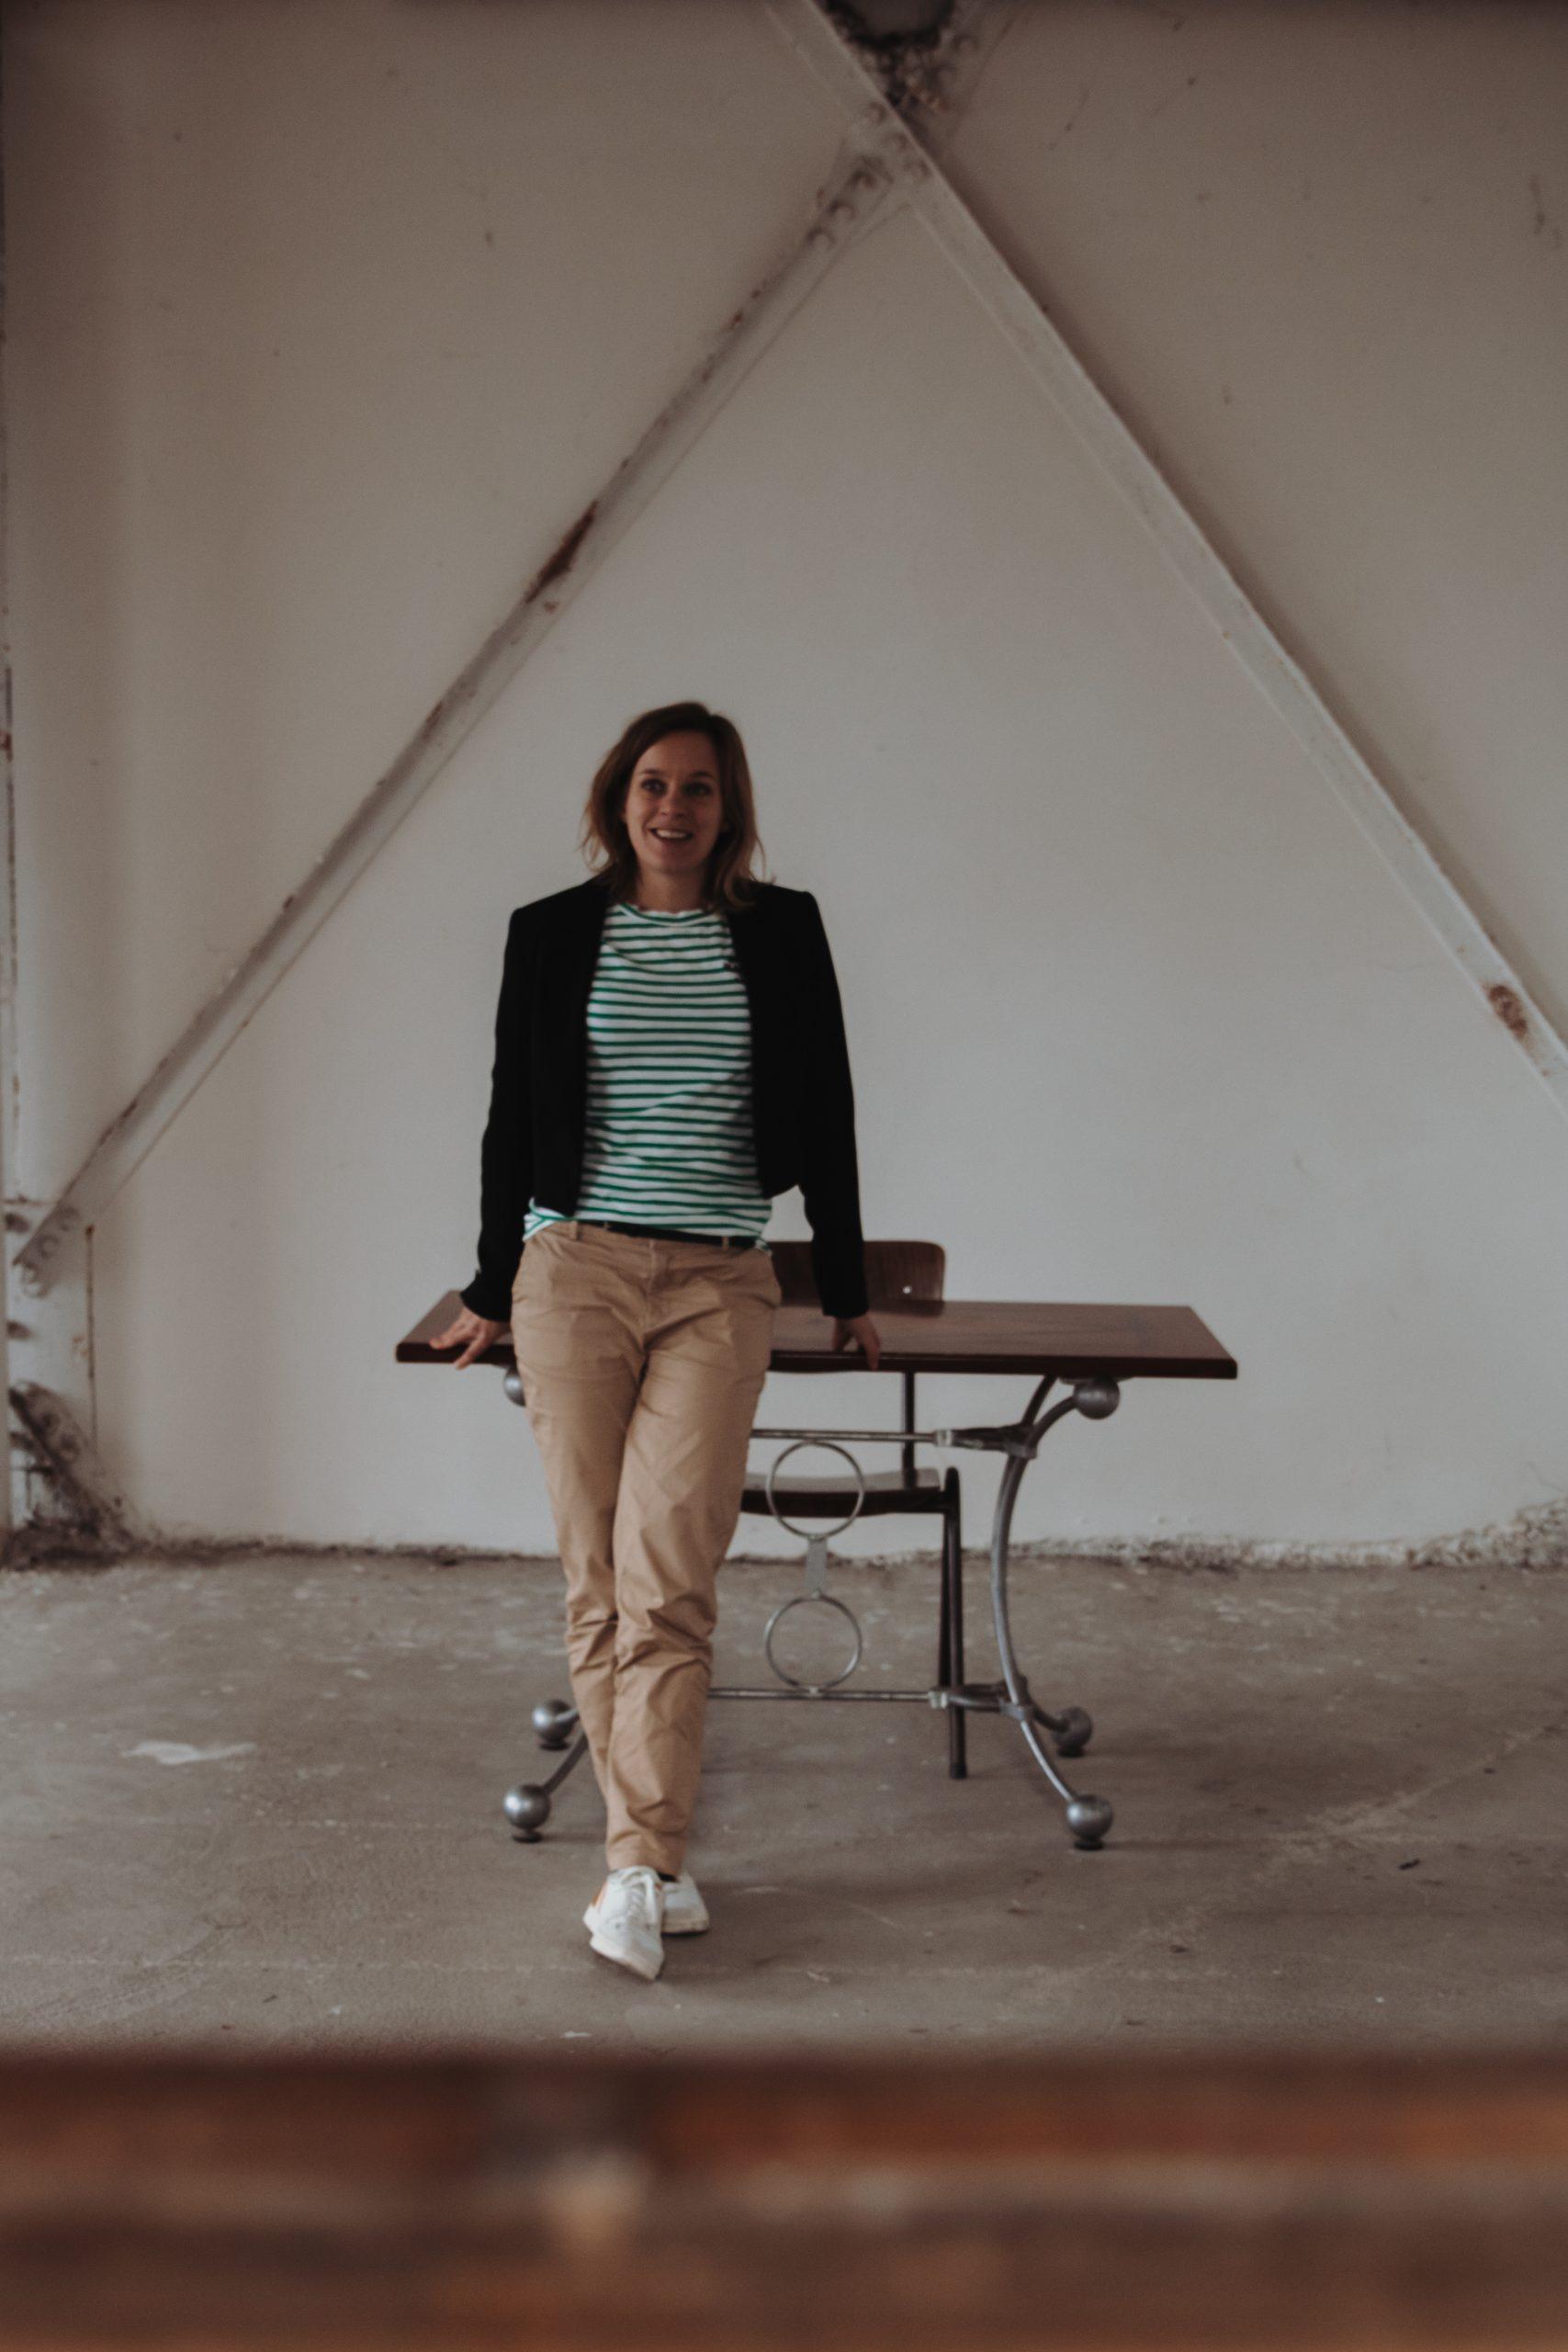 Schrijfster Saskia van den Brand